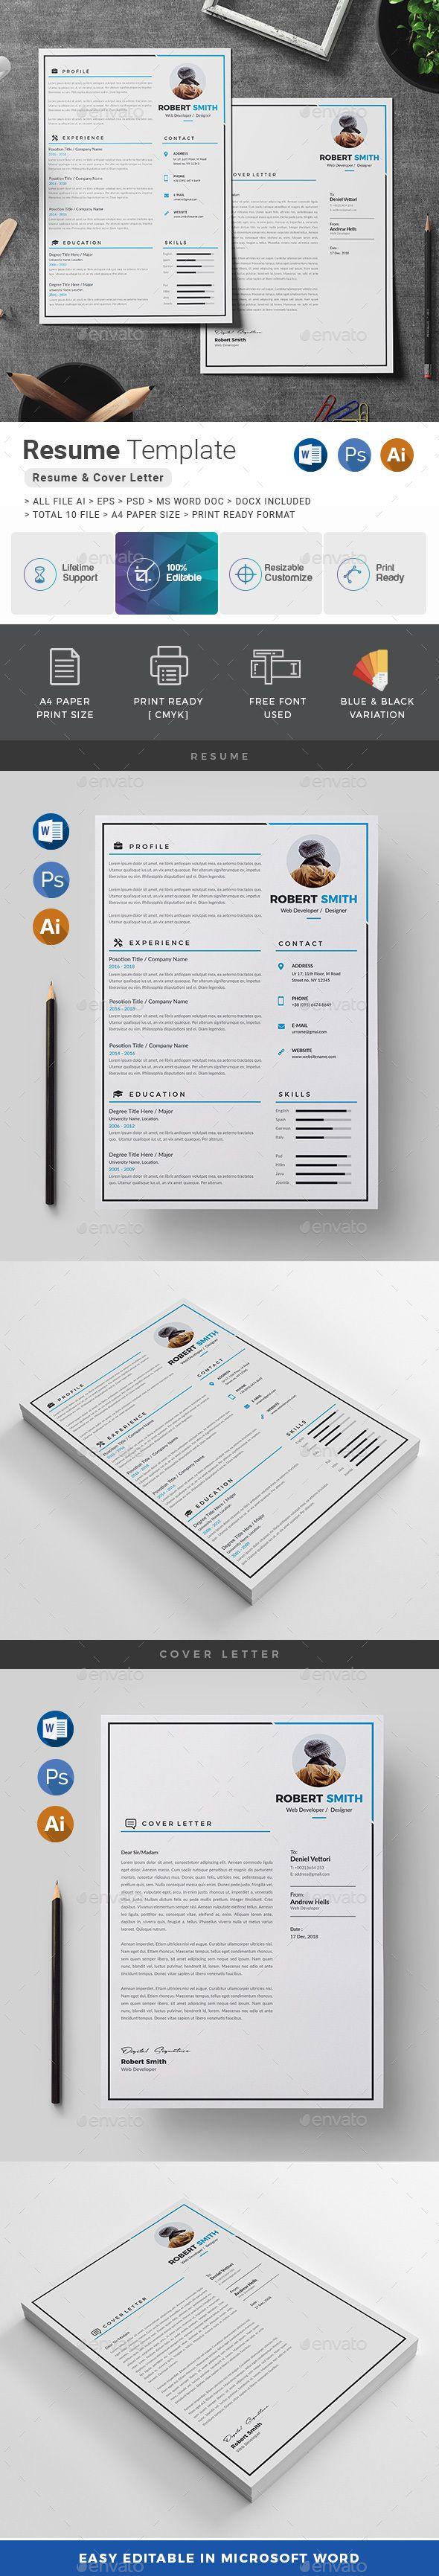 Resume Resume Best Resume Template Resume Template